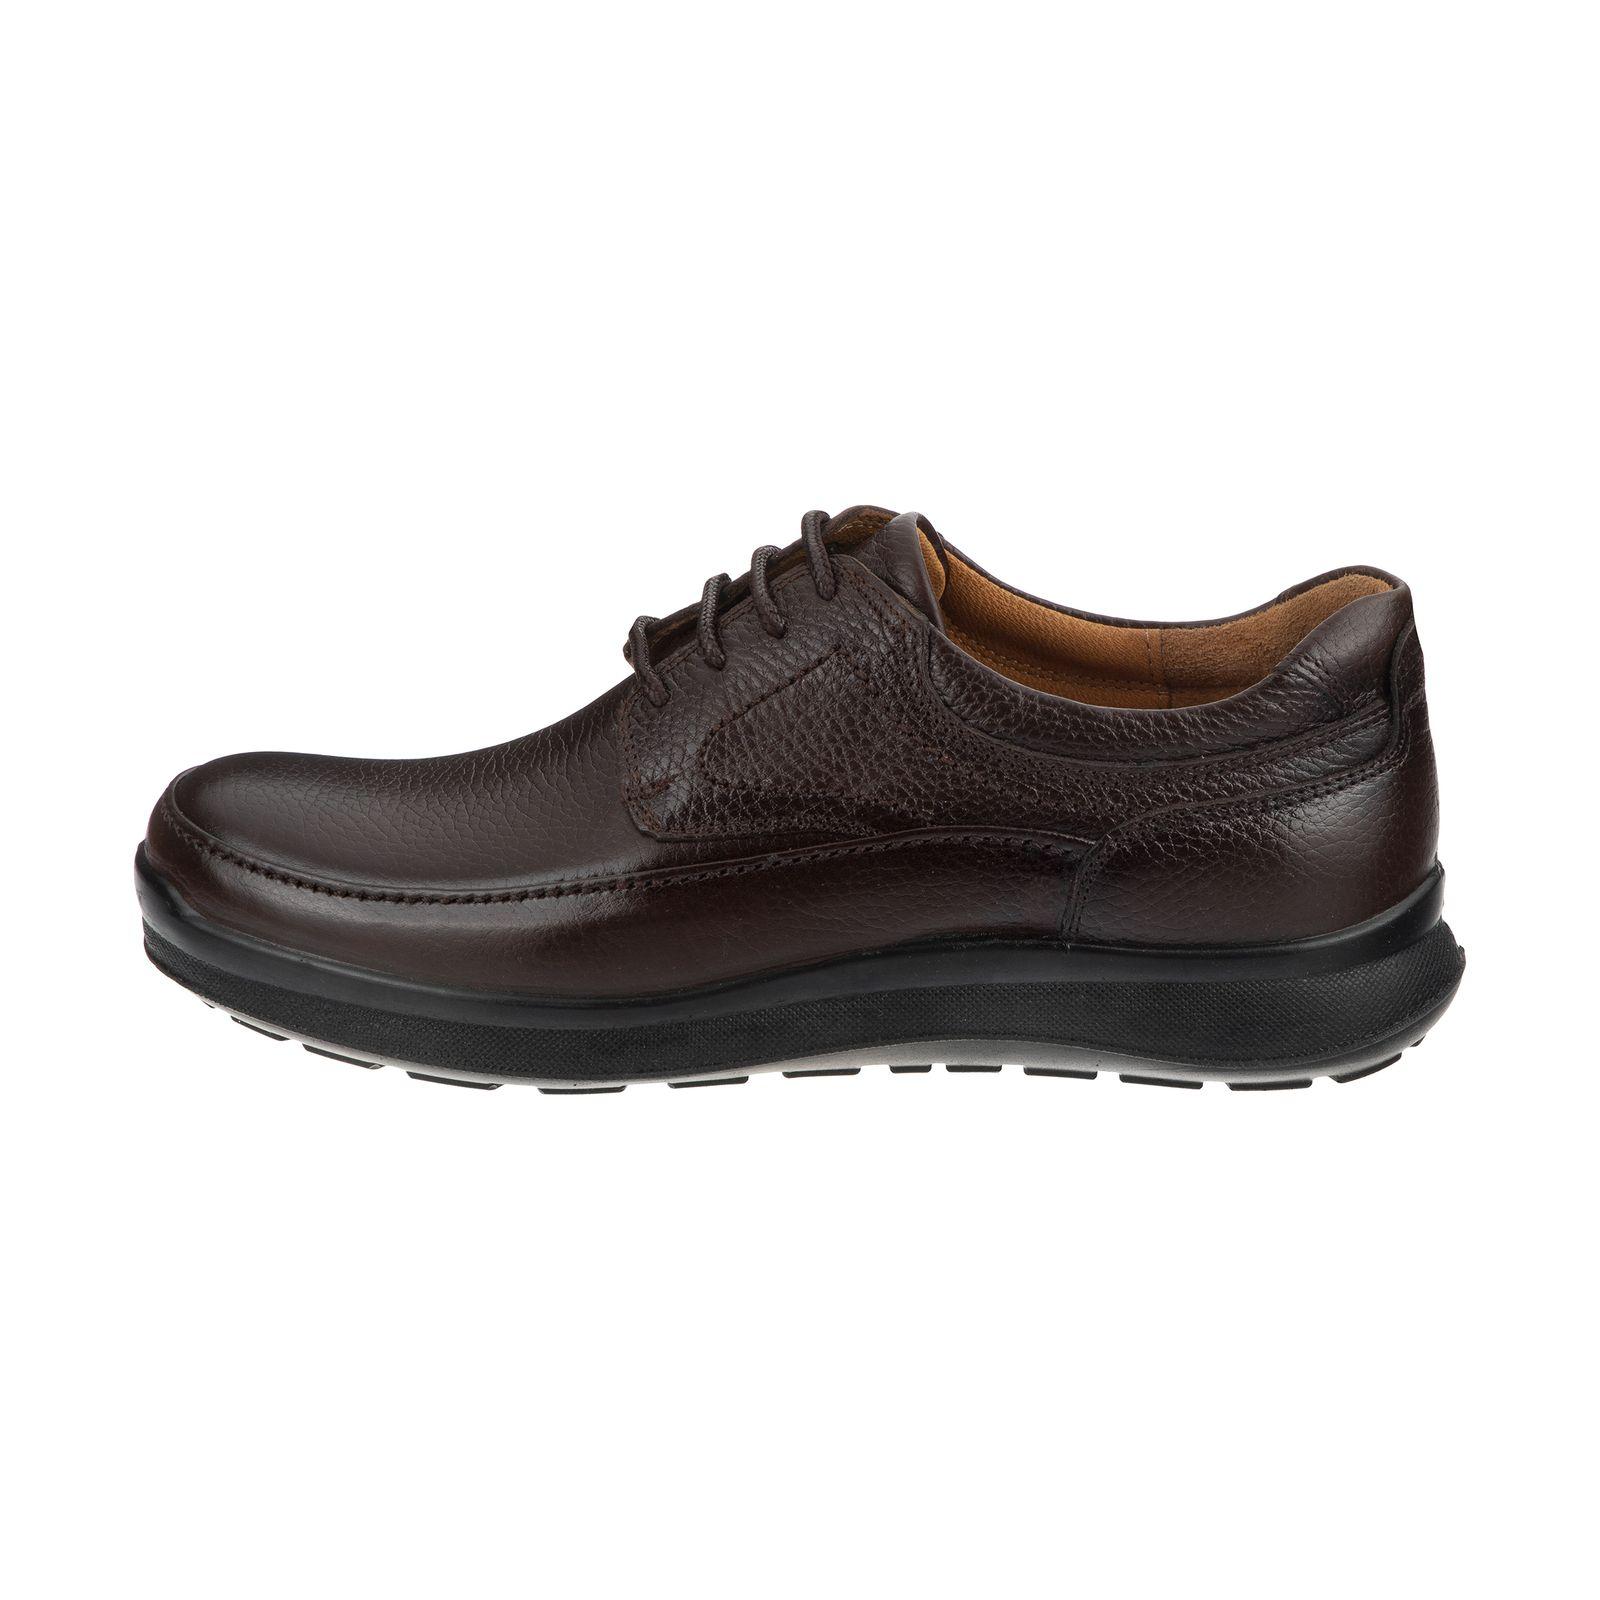 کفش روزمره مردانه بلوط مدل 7266C503104 -  - 2